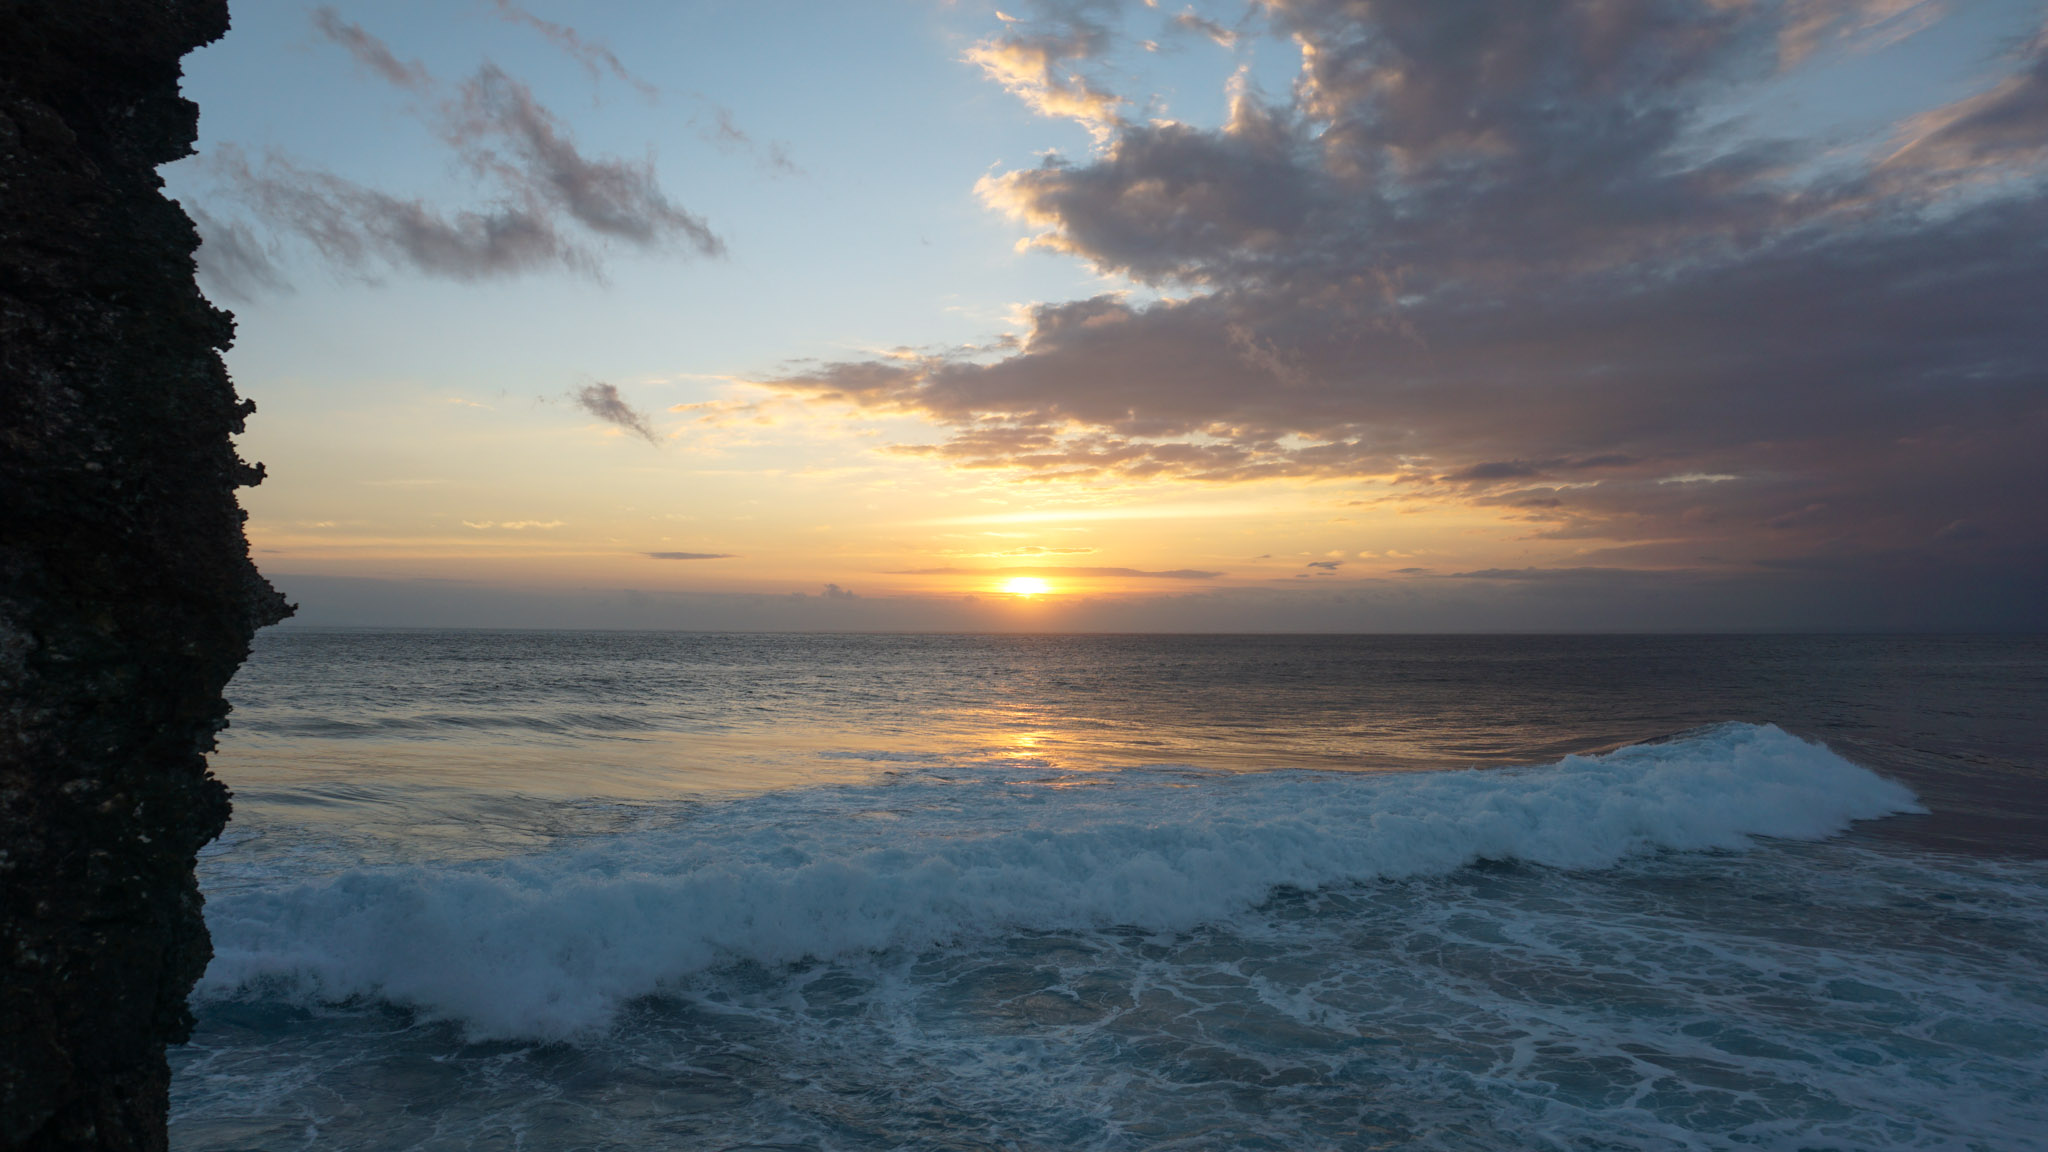 Sonnenuntergang auf Nusa Ceningan, Bali